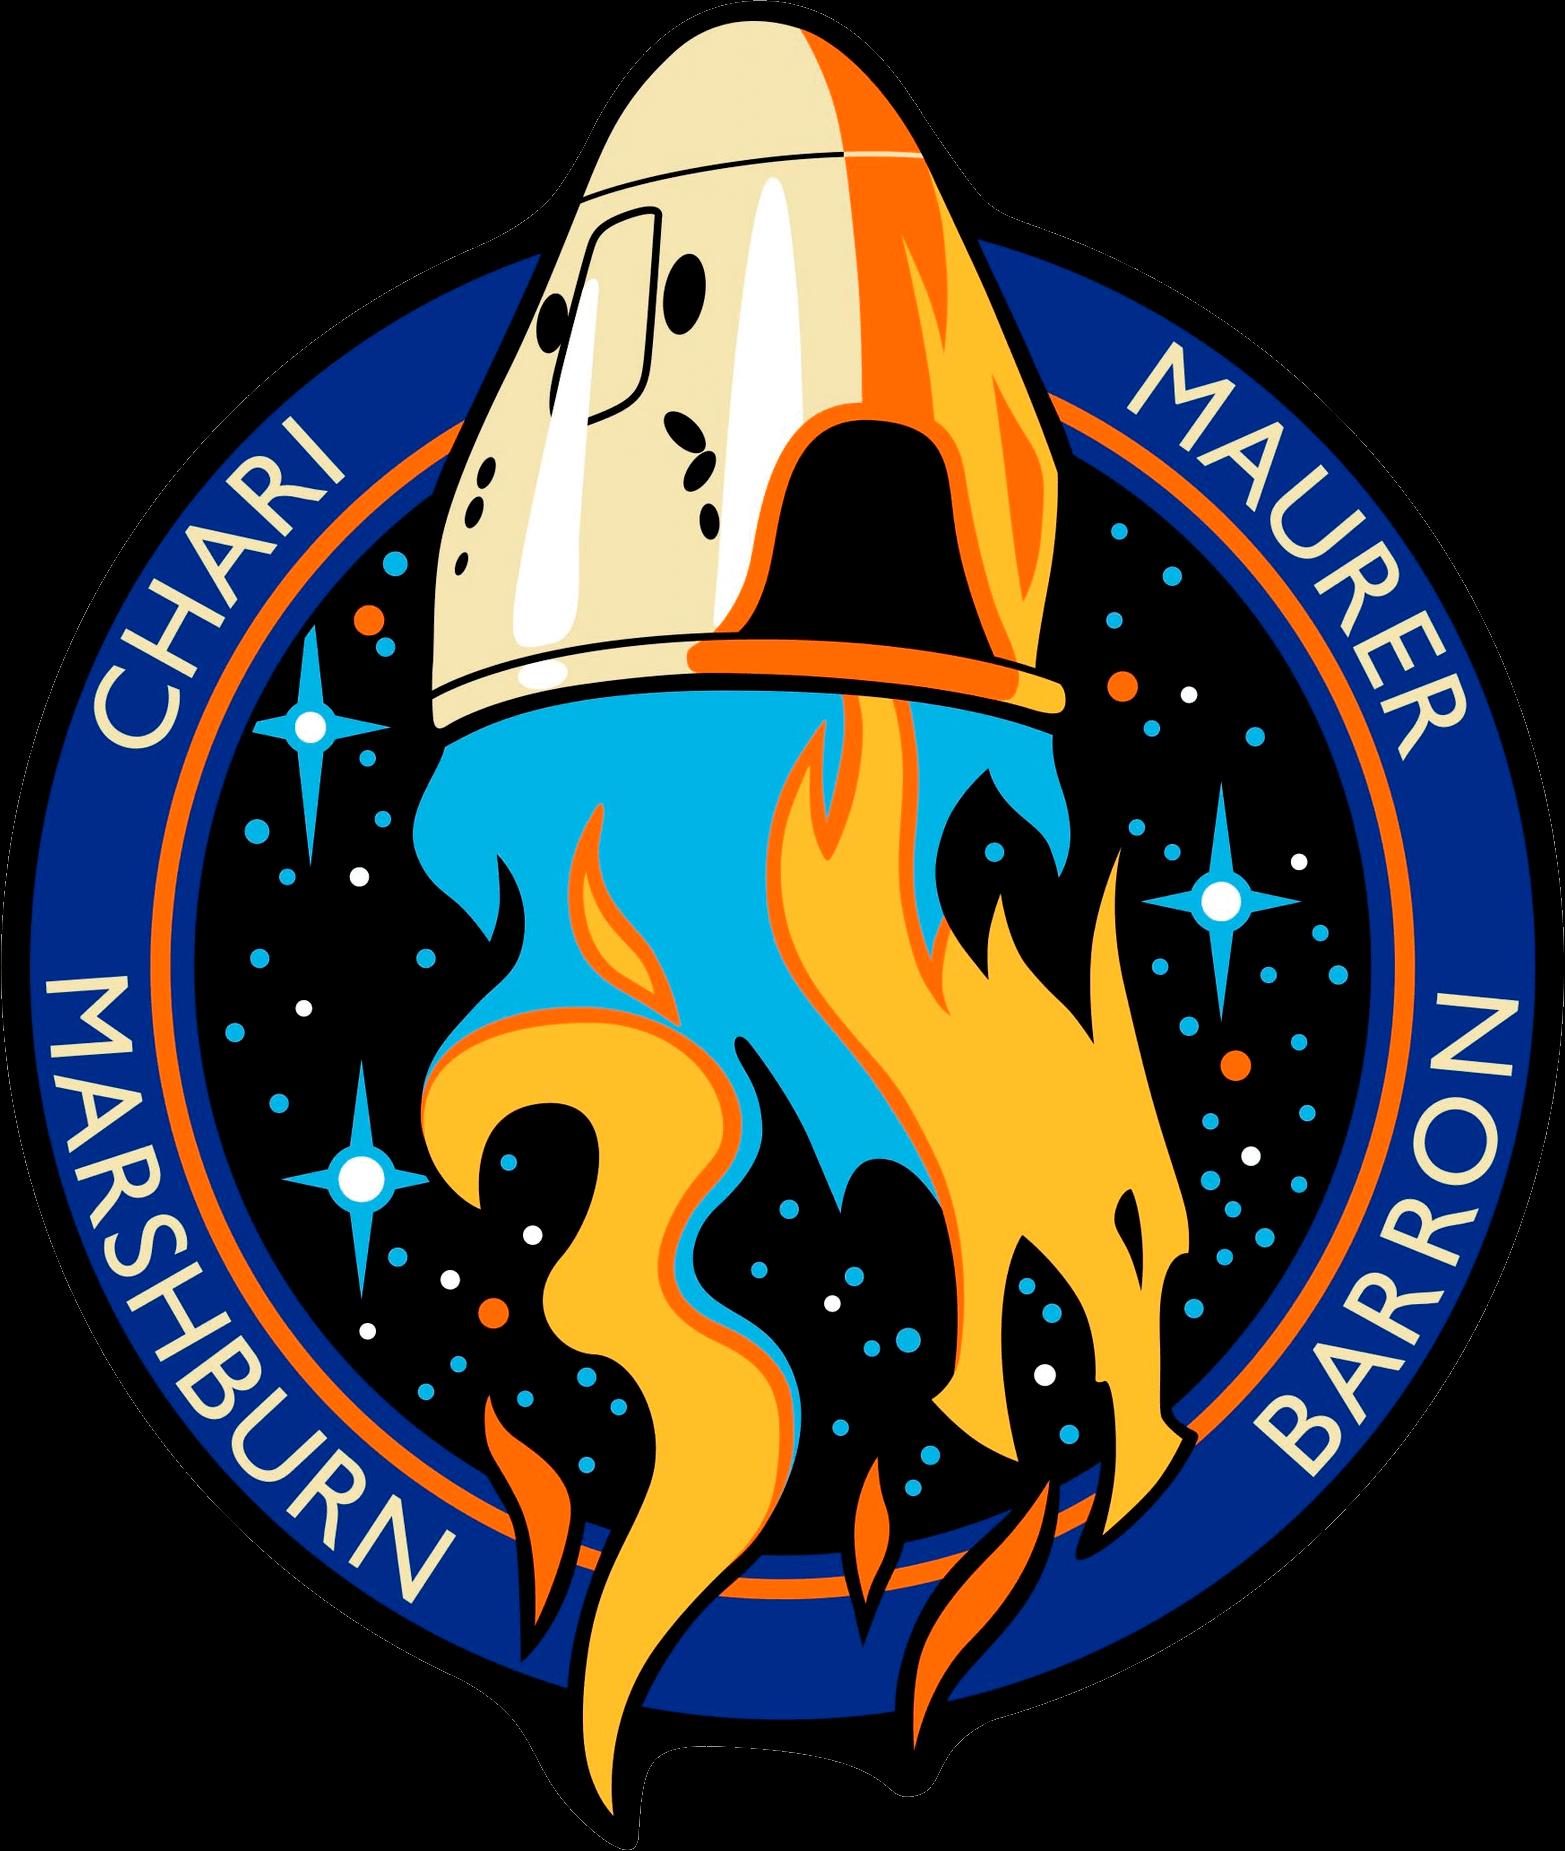 Mission patch for SpX USCV-3 (NASA Crew Flight 3)